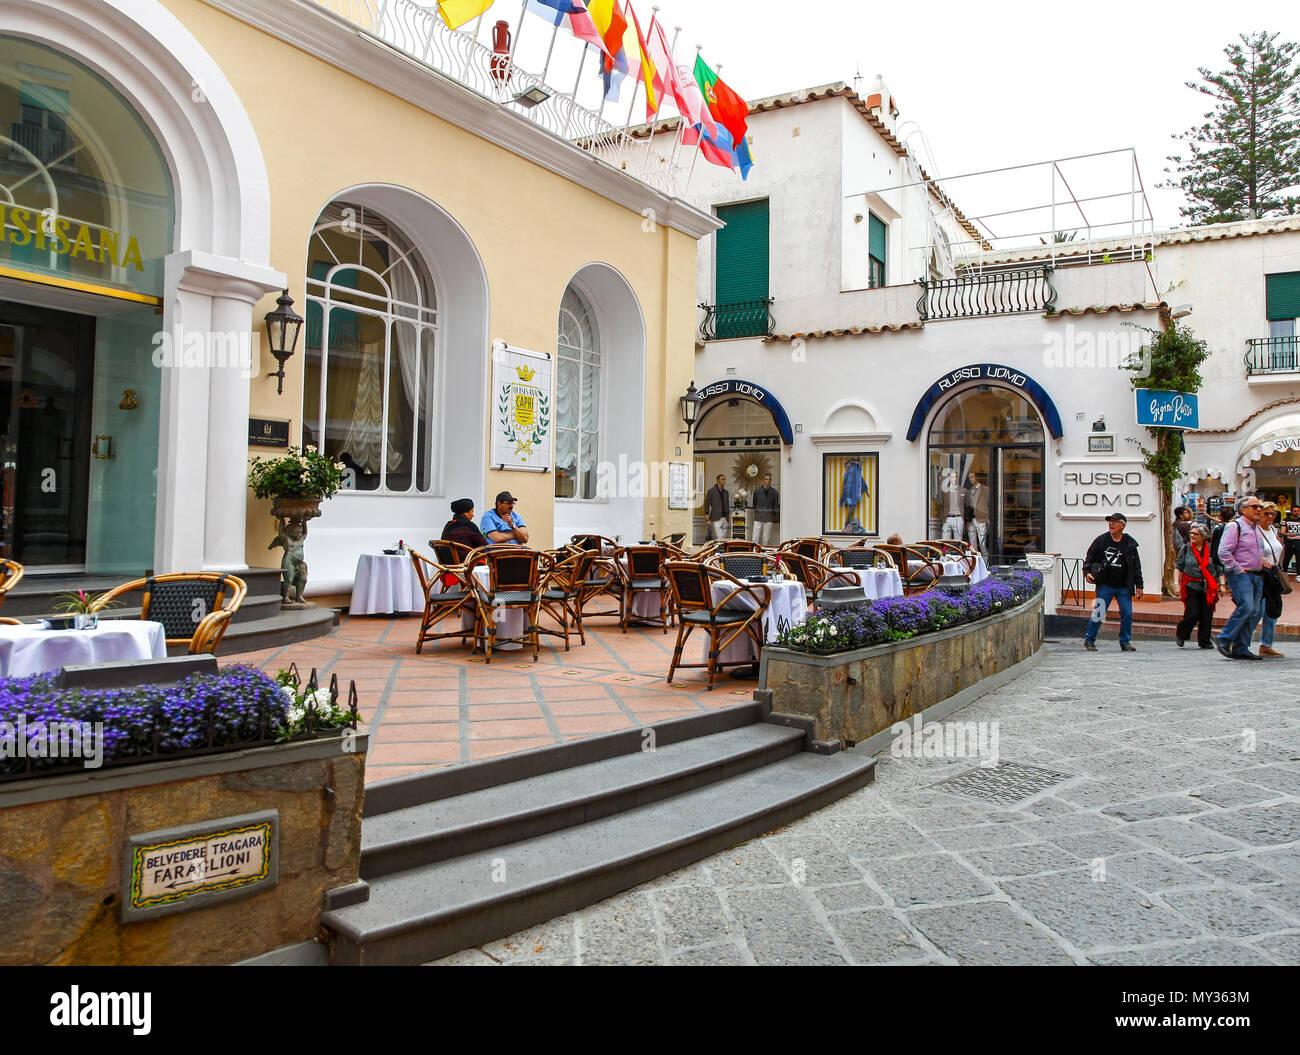 Grand Hotel Quisisana on Via Camerelle on the island of Capri, Campania, Italy - Stock Image